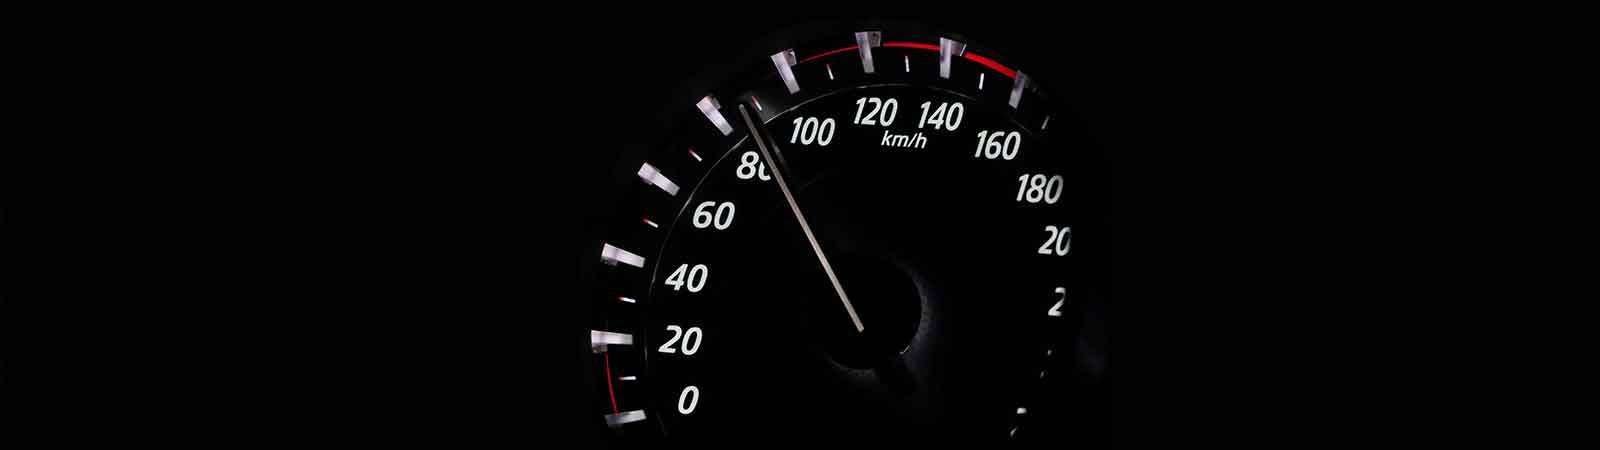 Snelheidsmeter auto techniek